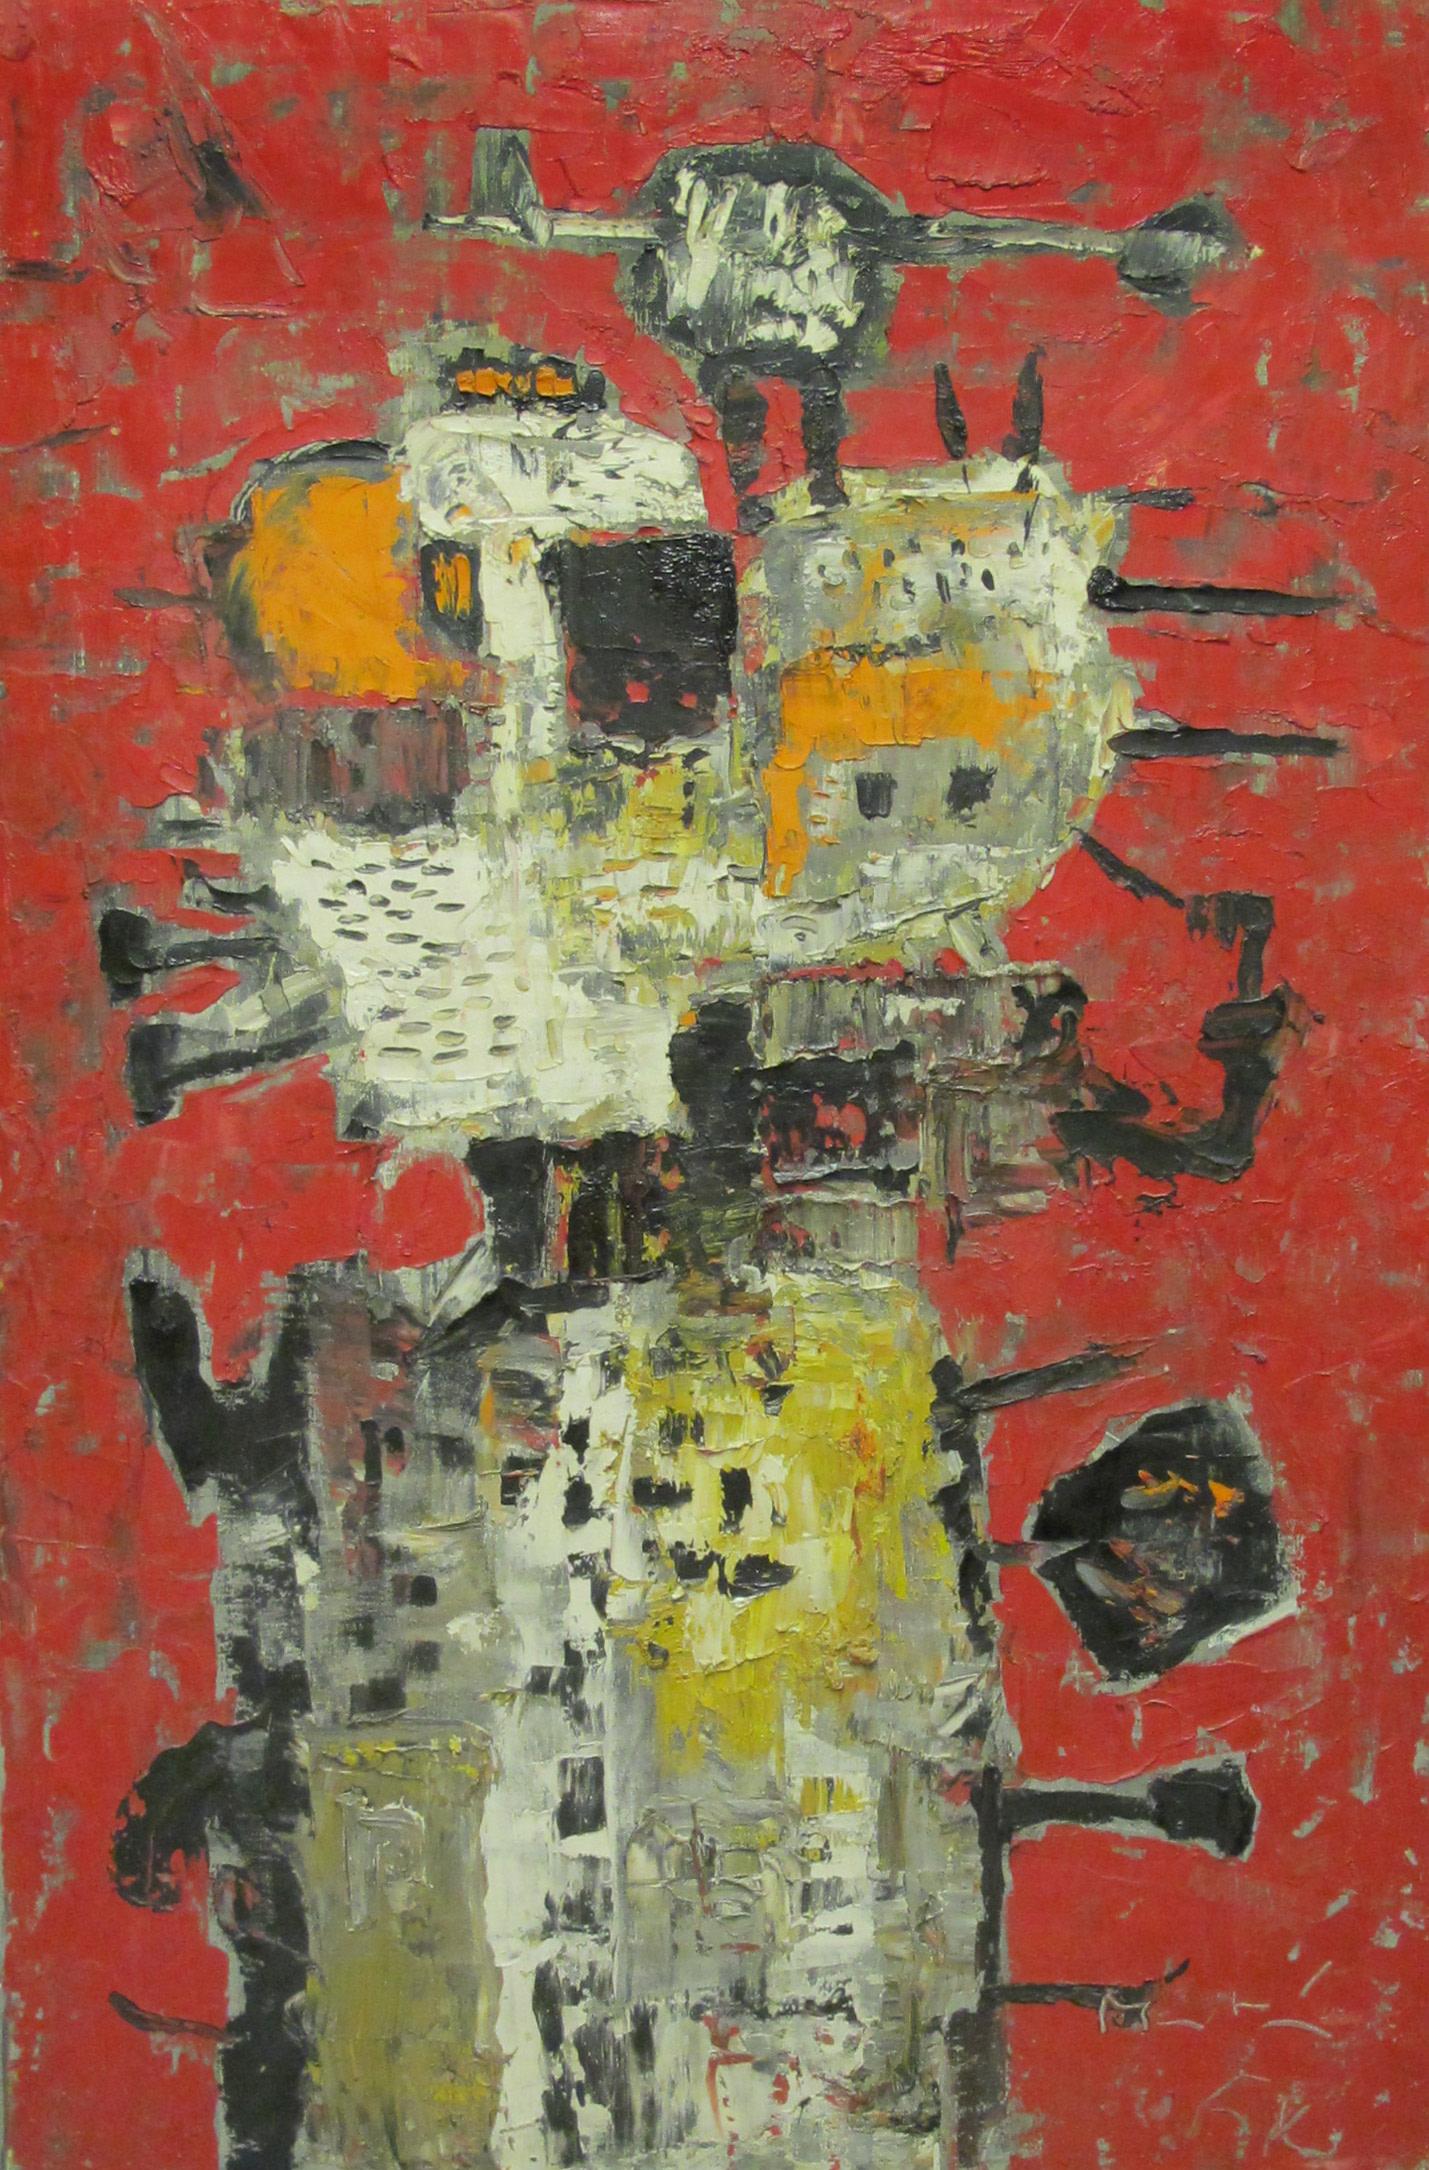 <span class=&#34;link fancybox-details-link&#34;><a href=&#34;/artists/26-martin-bradley/works/754/&#34;>View Detail Page</a></span><div class=&#34;artist&#34;><strong>Martin Bradley</strong></div> Born 1931 <div class=&#34;title&#34;><em>Mijne Vlaamsche Tante</em></div> <div class=&#34;signed_and_dated&#34;>signed and dated '54<br /> also signed, titled and dated verso</div> <div class=&#34;medium&#34;>oil on canvas</div> <div class=&#34;dimensions&#34;>91.5 x 61 cms (36 x 24 ins)</div>